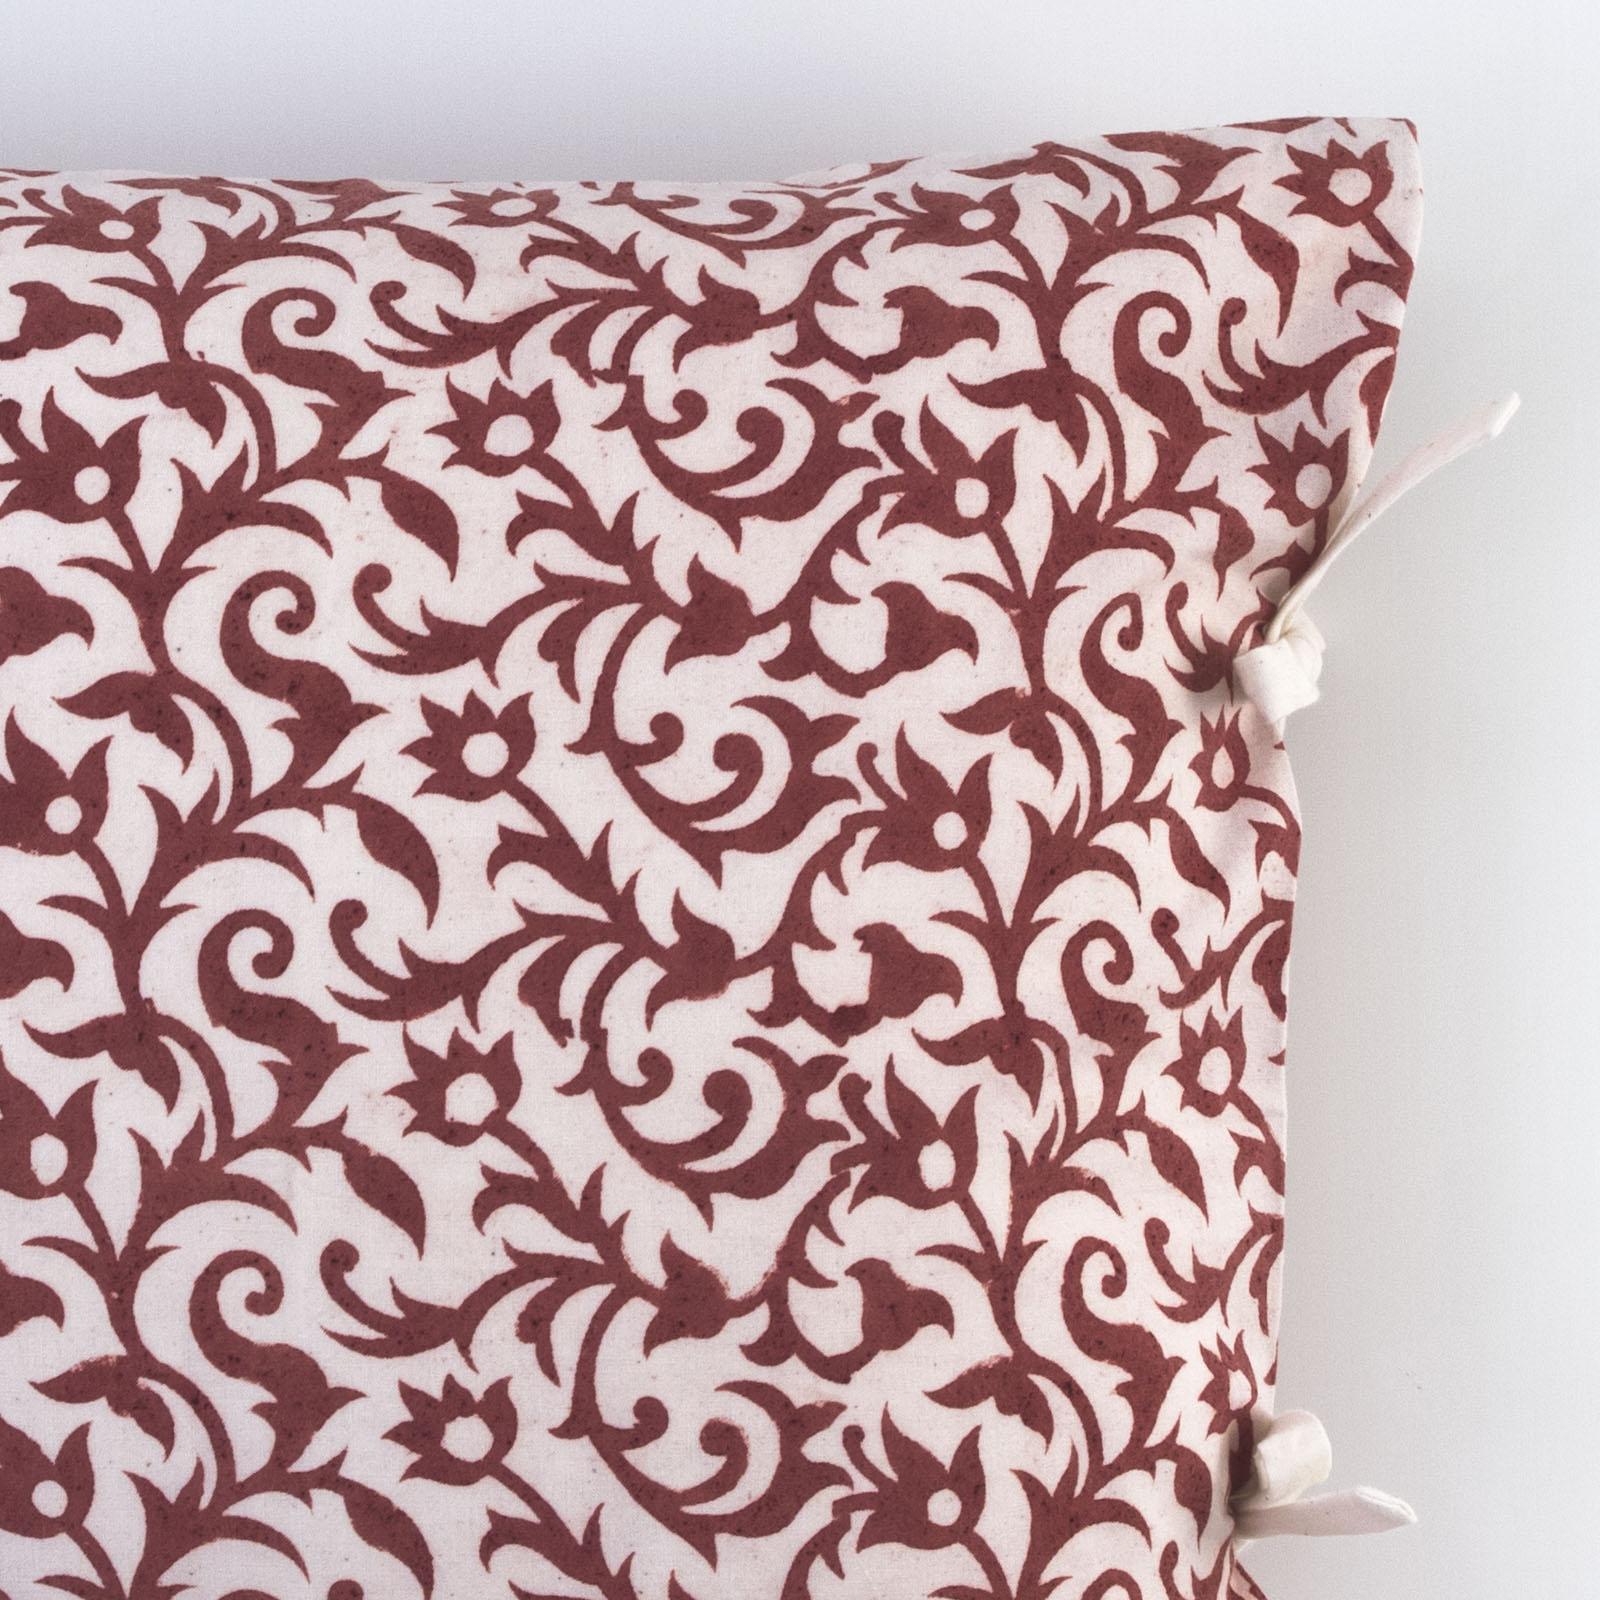 anais small deco pillow les indiennes. Black Bedroom Furniture Sets. Home Design Ideas